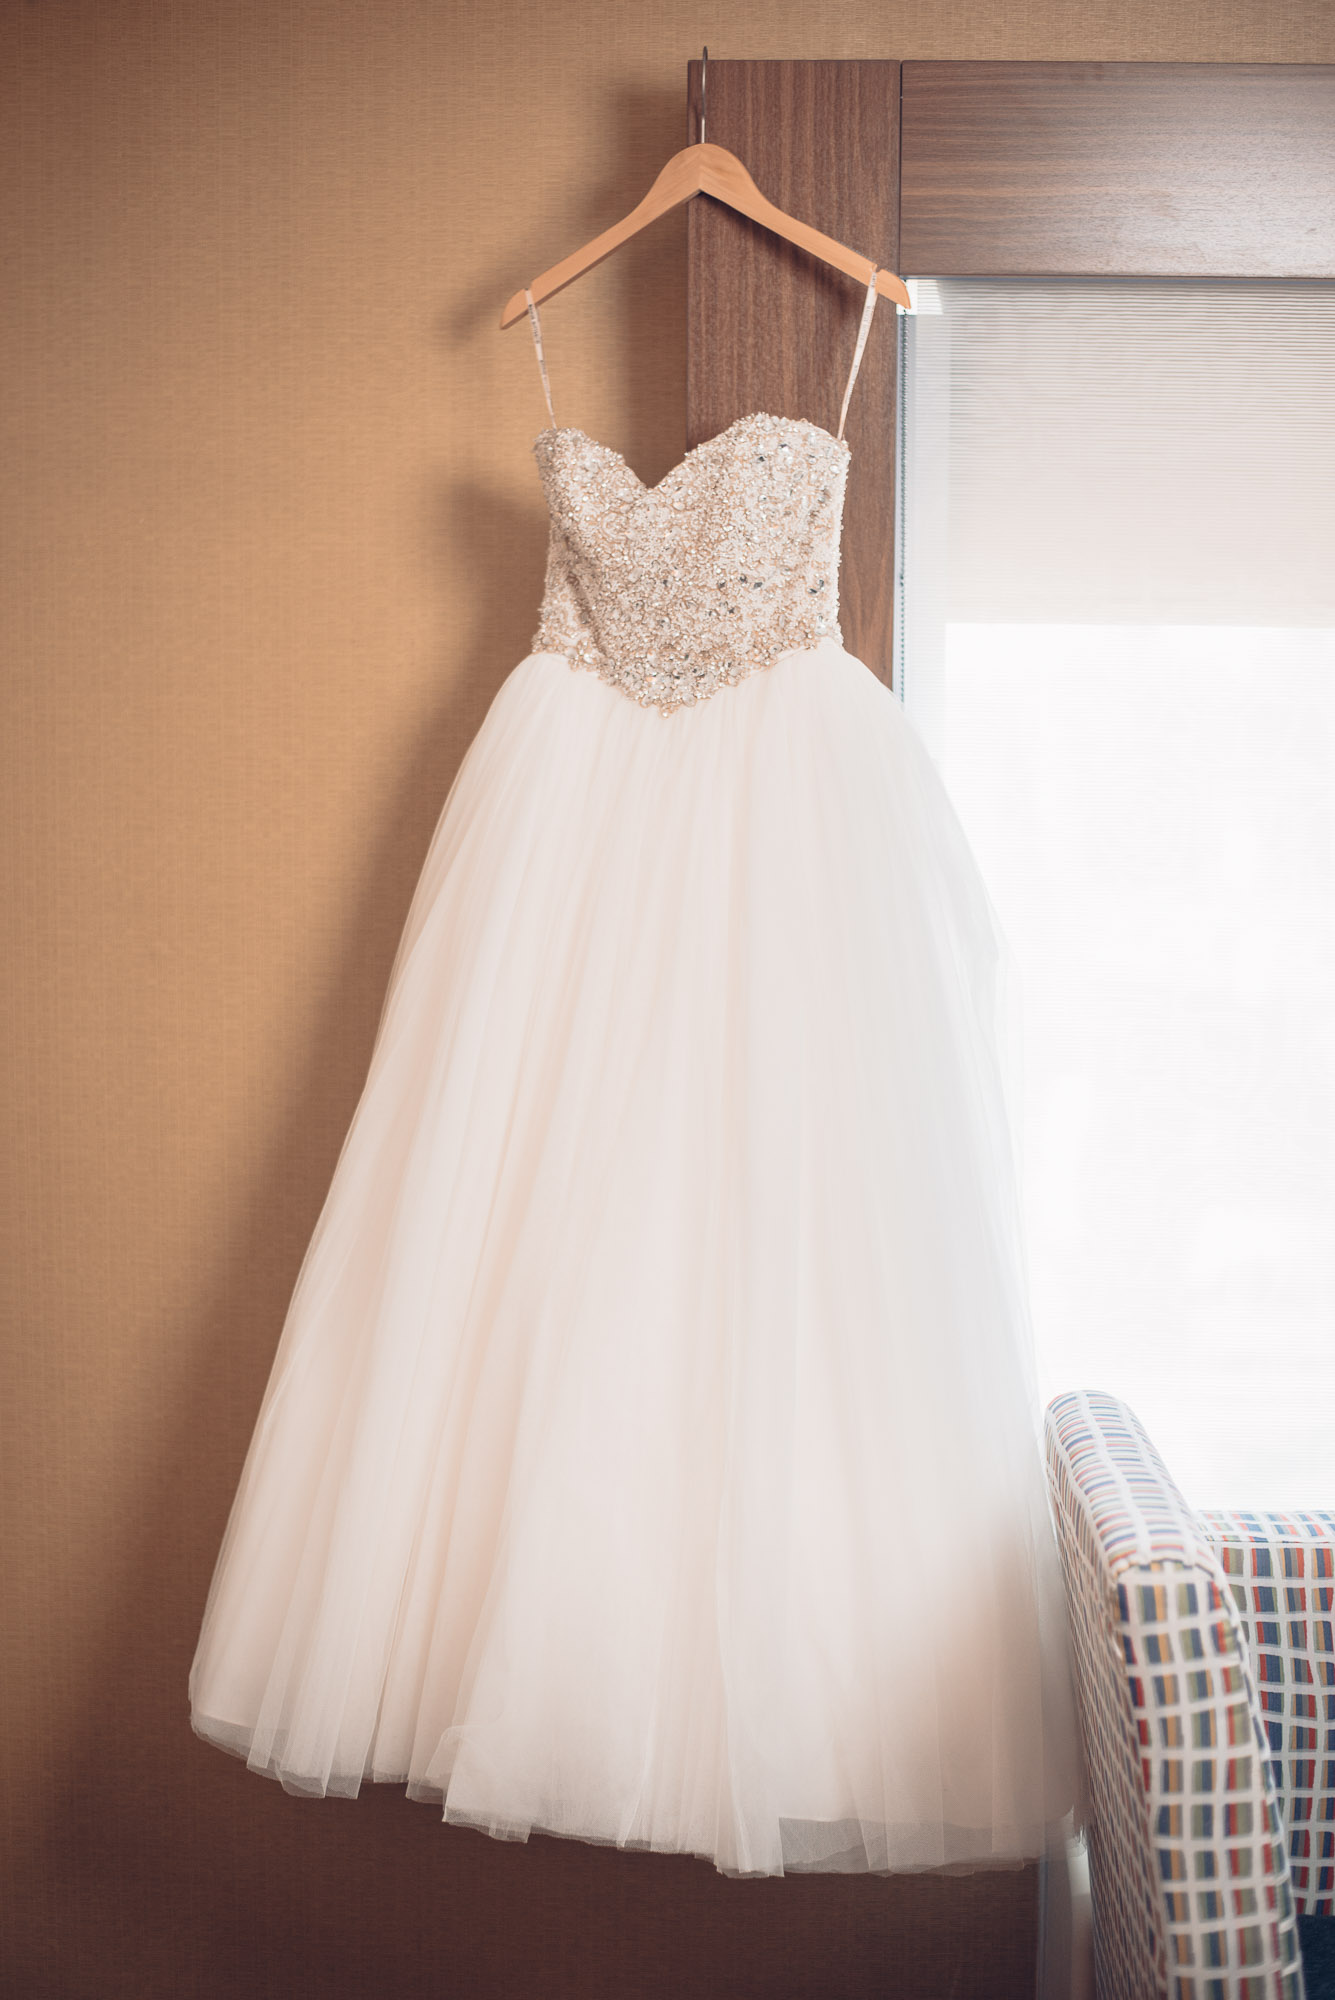 woodwinds_wedding_171020_web-11.jpg